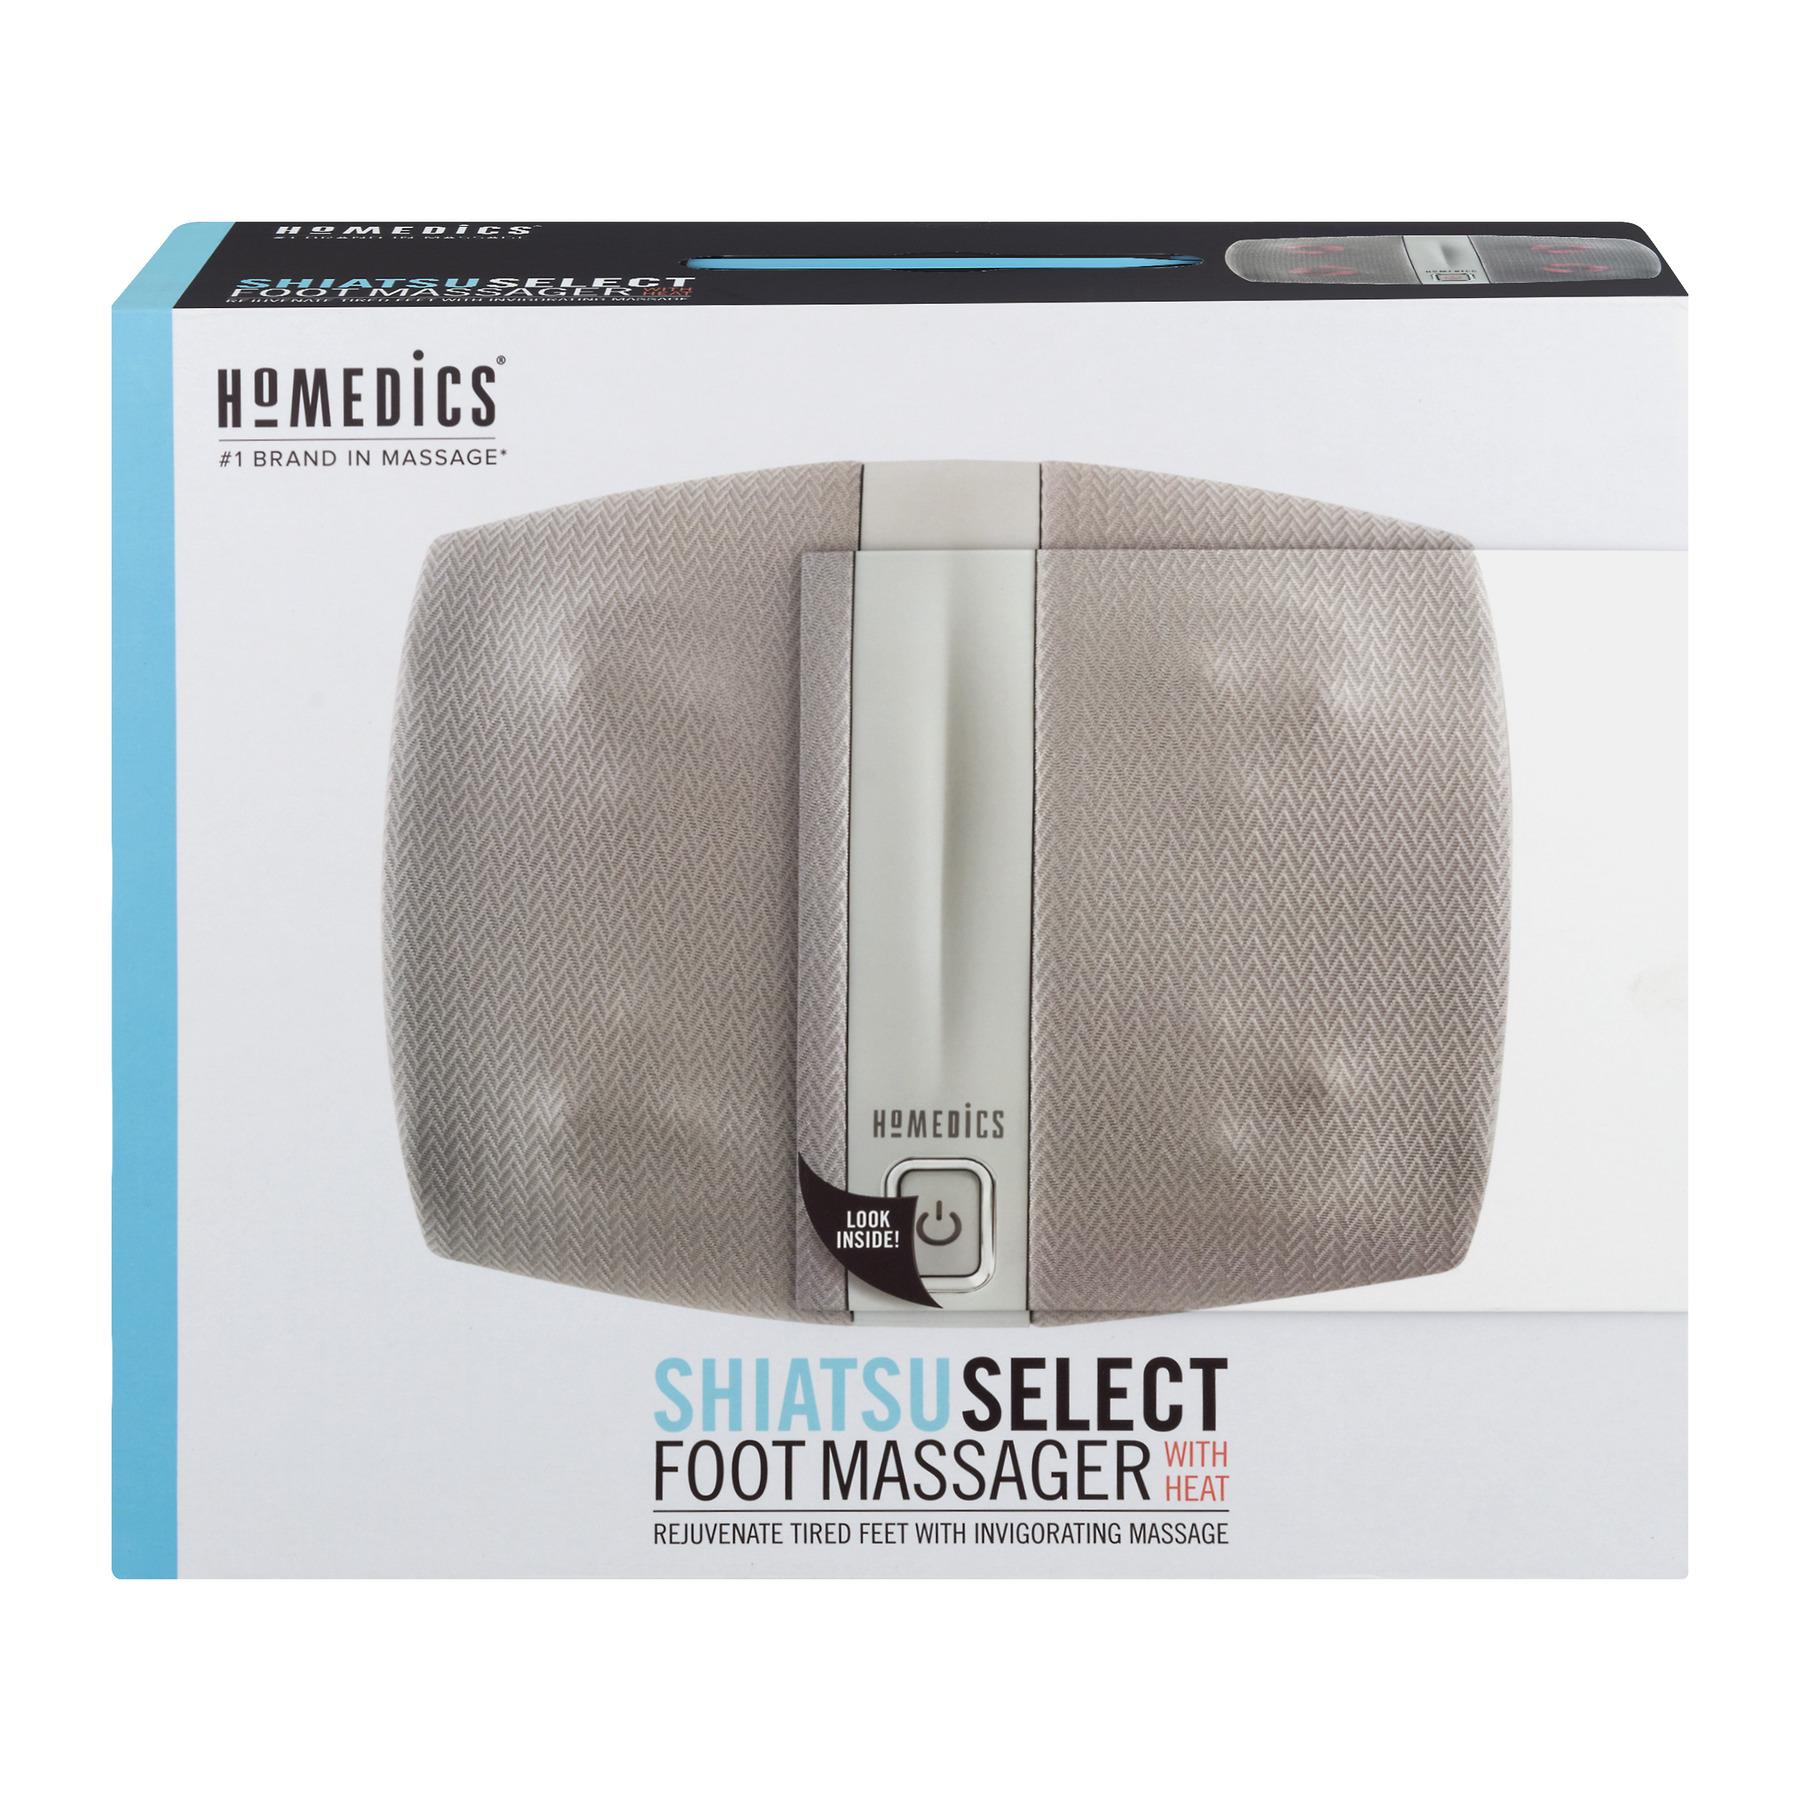 HoMedics Shiatsu Select Foot Massager with Heat, Deep Kneading And Relaxing Massage, FMS-255H